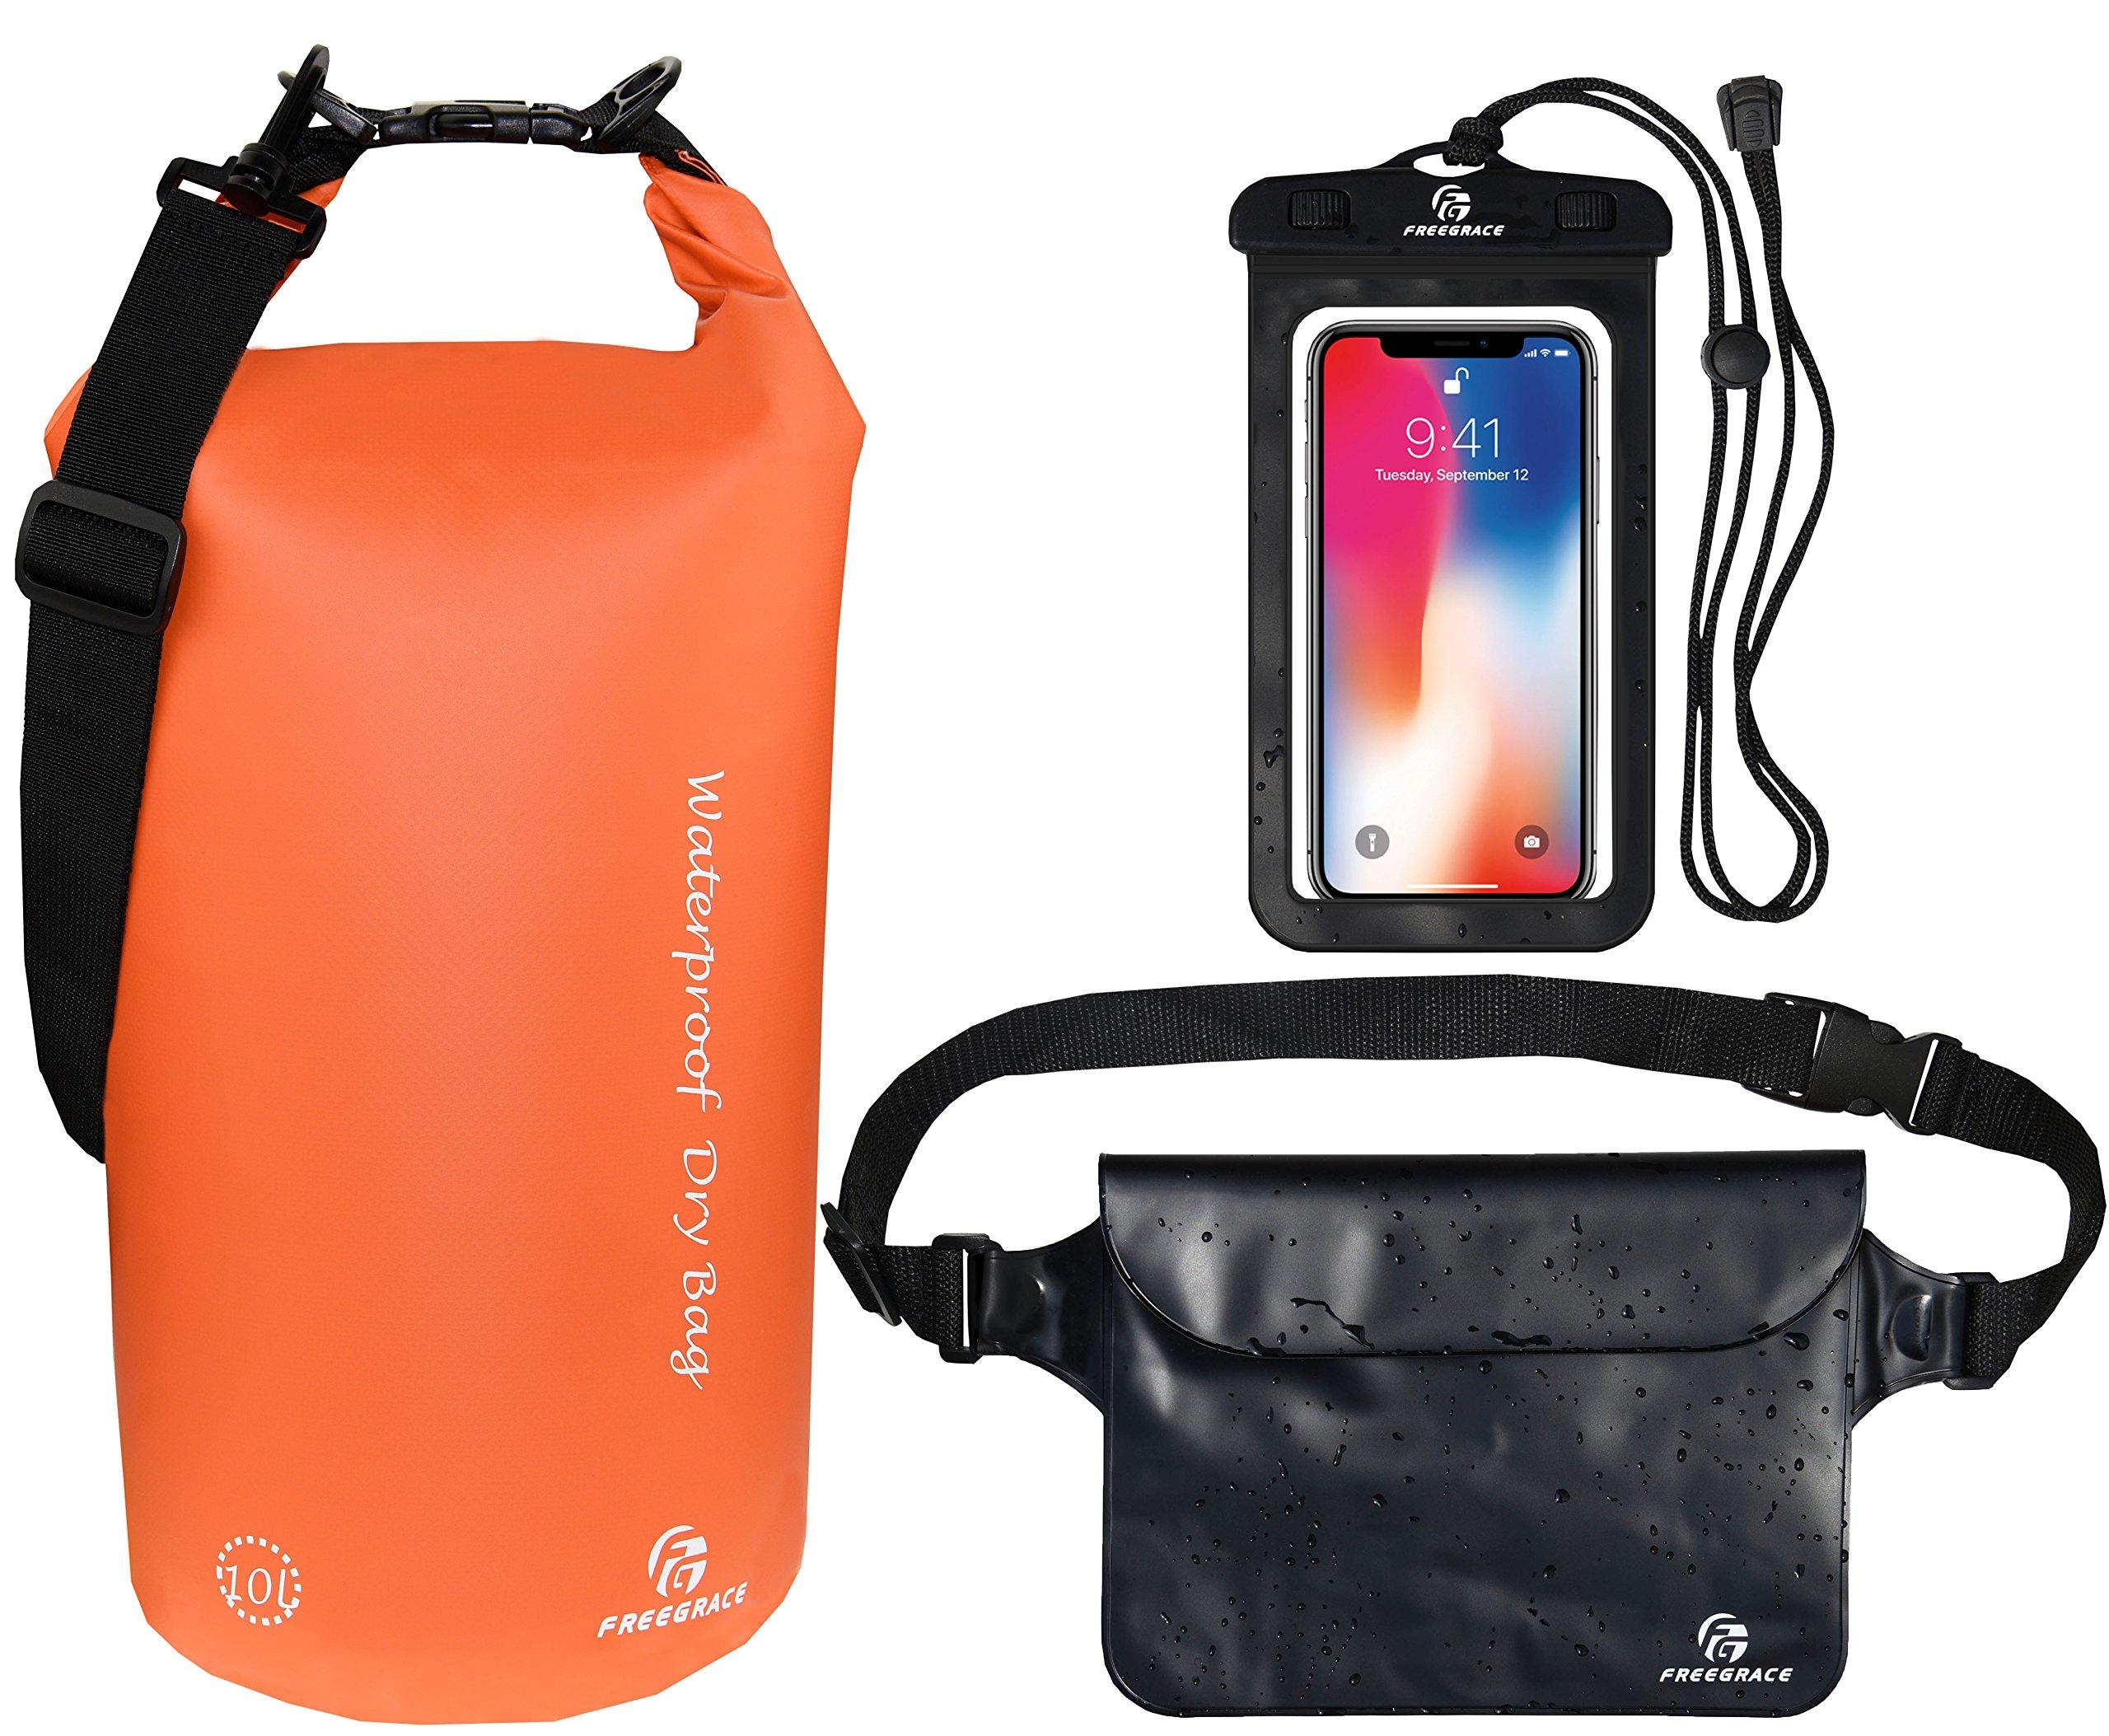 03a9cc5a99 Freegrace Waterproof Dry Bags Set of 3 - Dry Bag 2 Zip Lock Seals &  Detachable